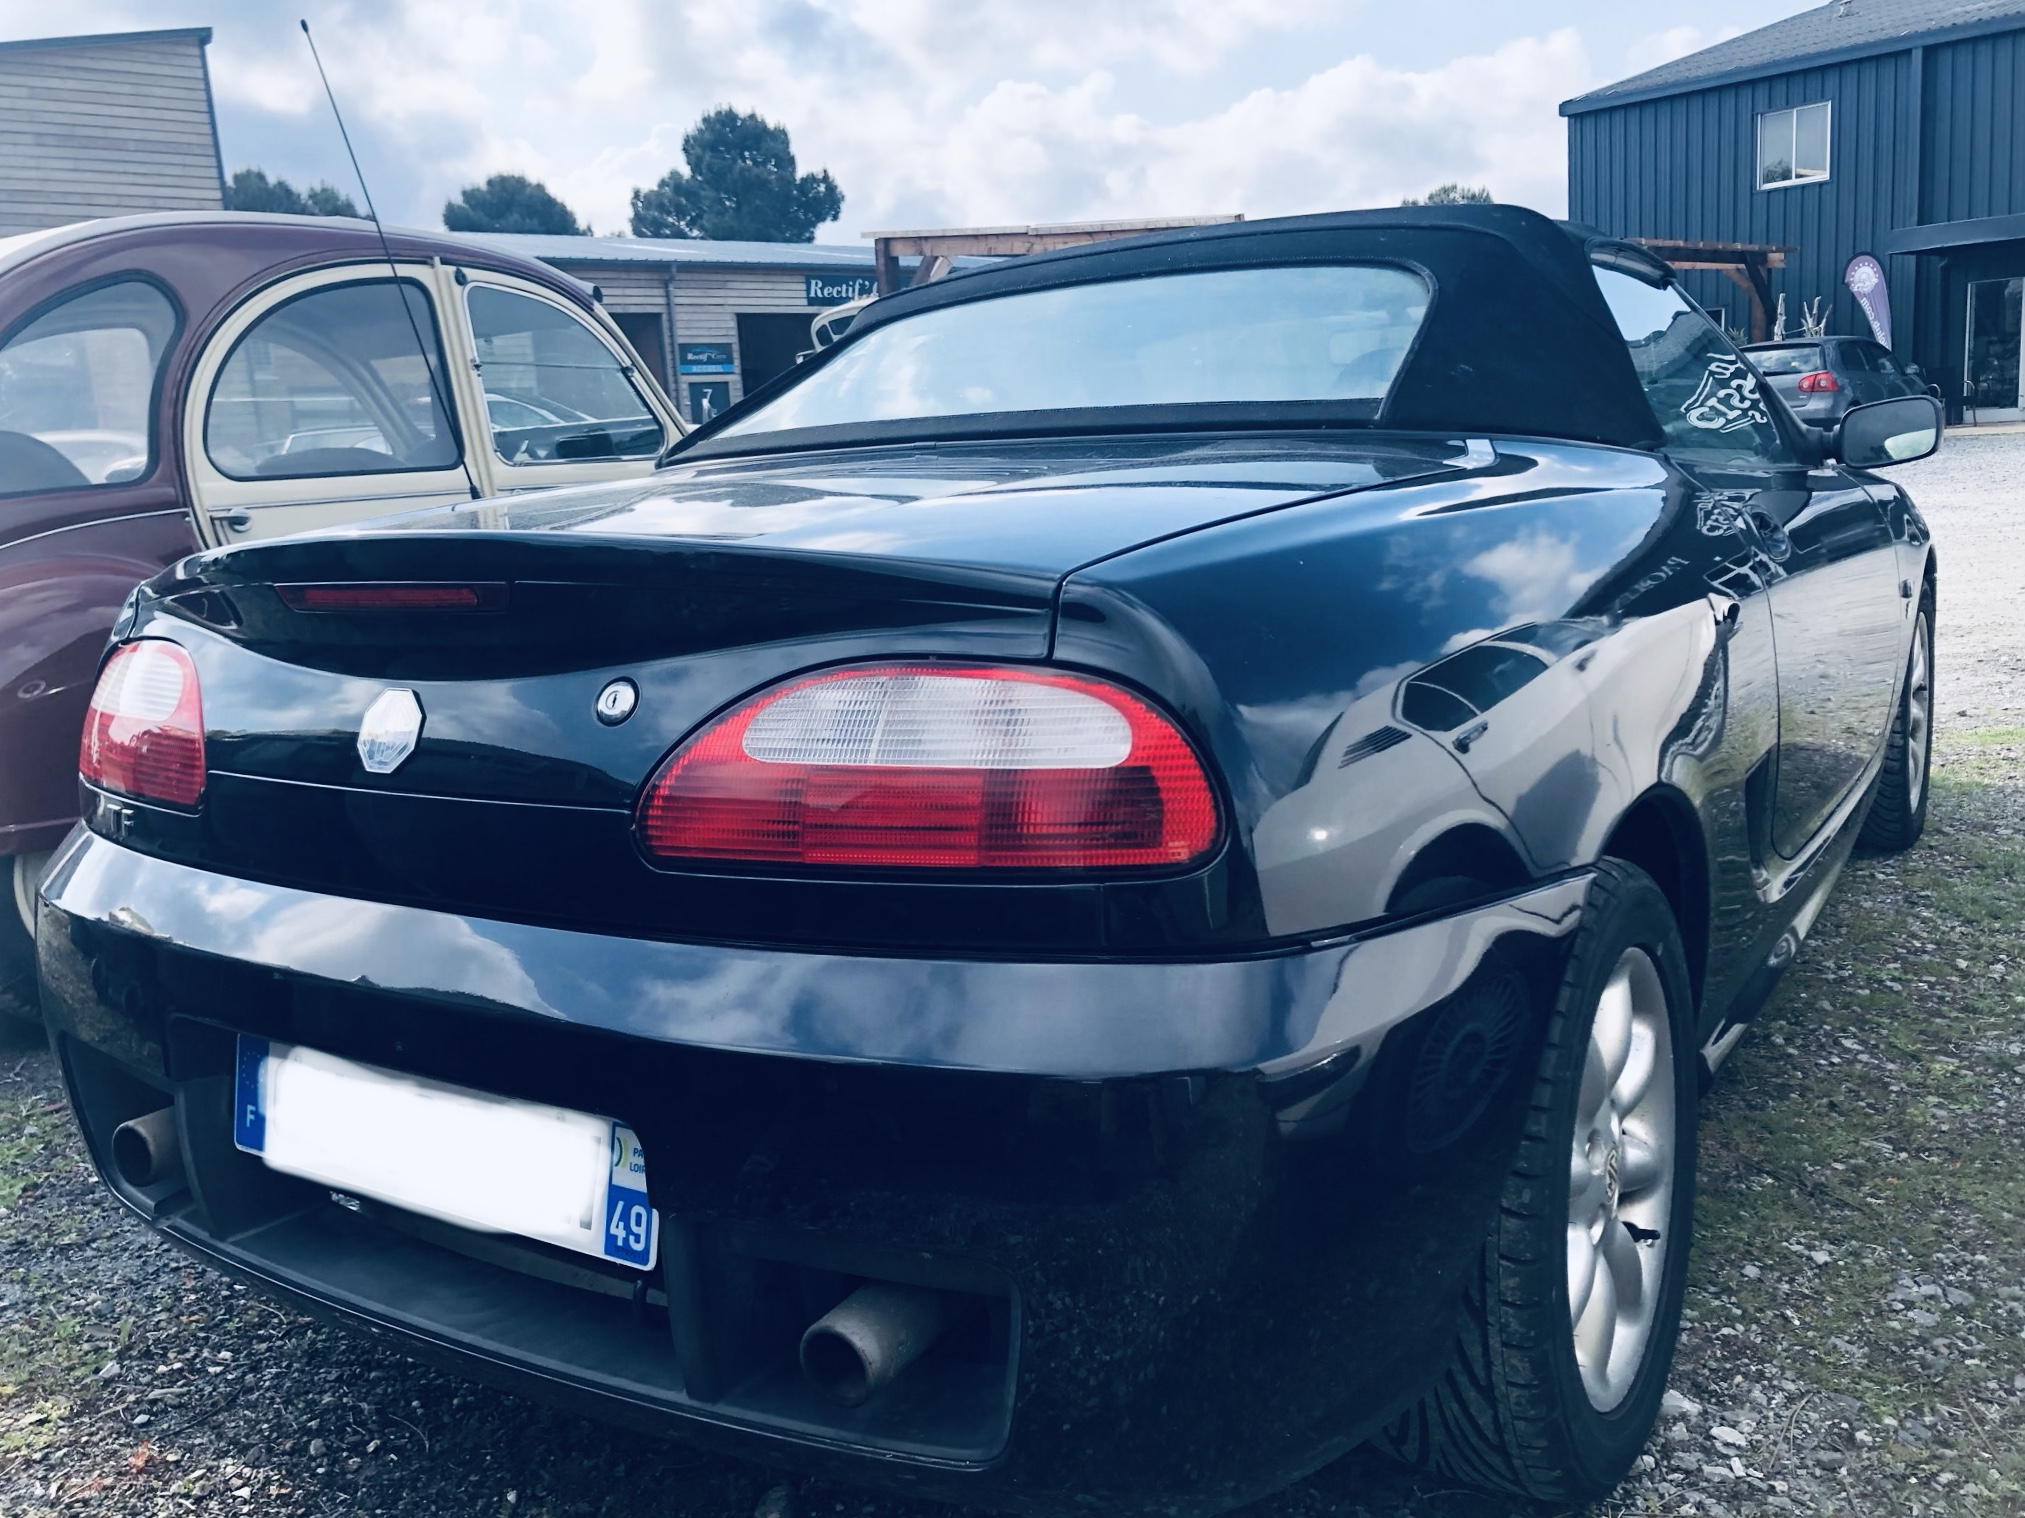 A vendre roadster cabriolet MG TF I.6 116 rhd